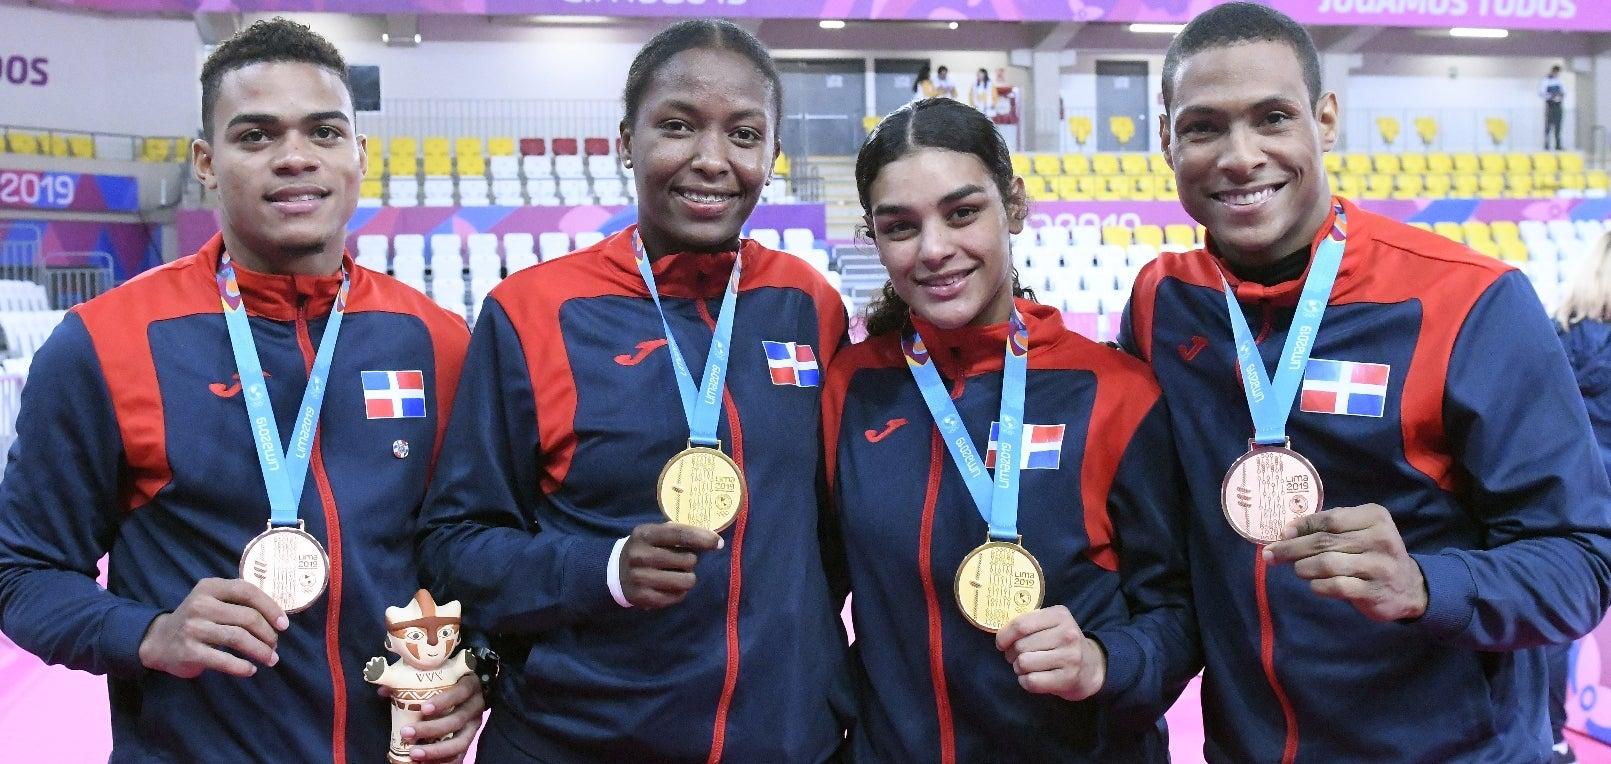 RD supera expectativas ganando 40 medallas